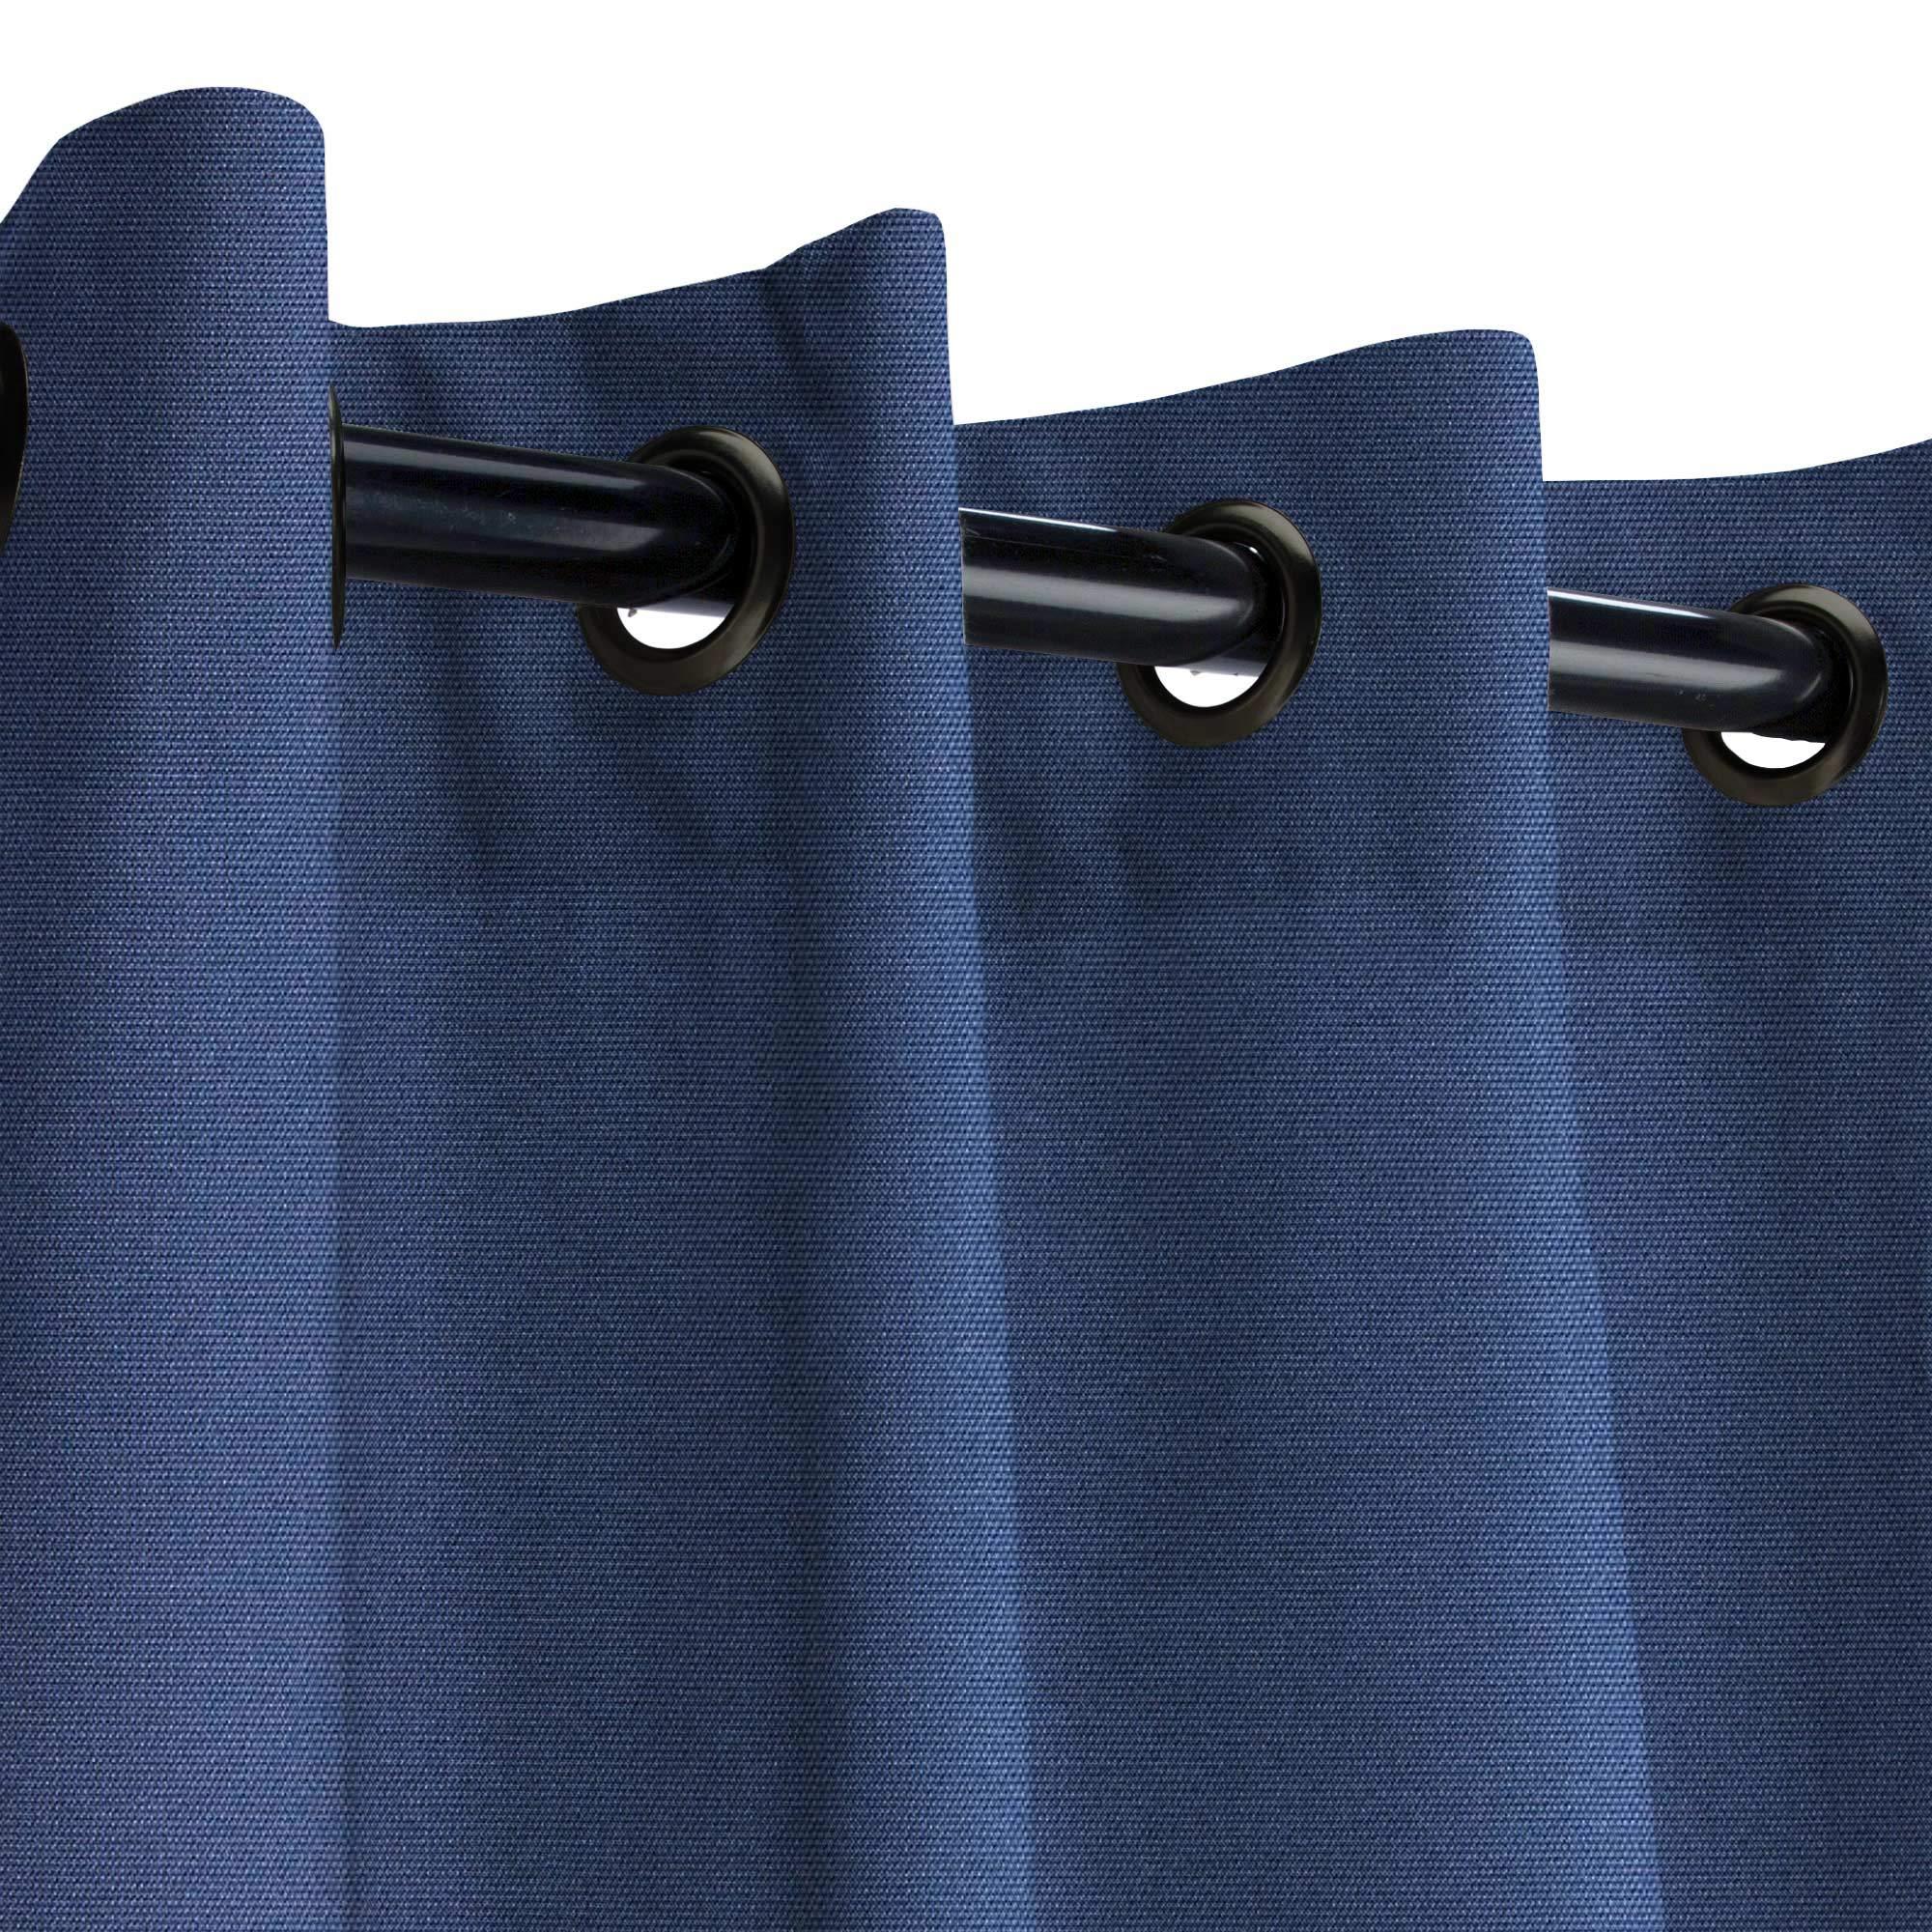 Sunbrella Canvas Navy Outdoor Curtain with Dark Gunmetal Grommets 50 in. Wide x 84 in. Long